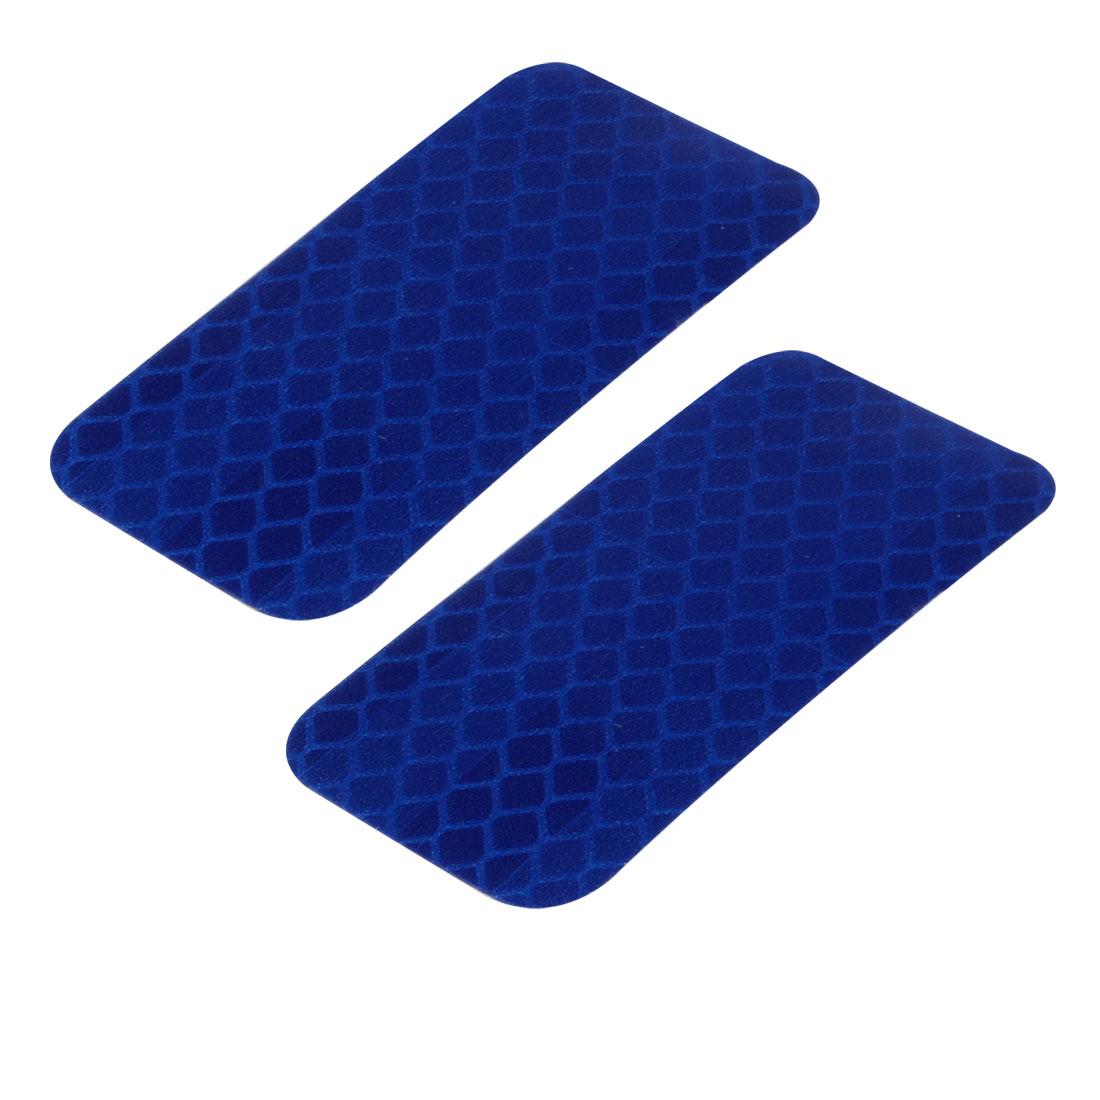 2pcs Honeycomb Reflective Warning Tape Film Sticker Blue 30mm x 60mm